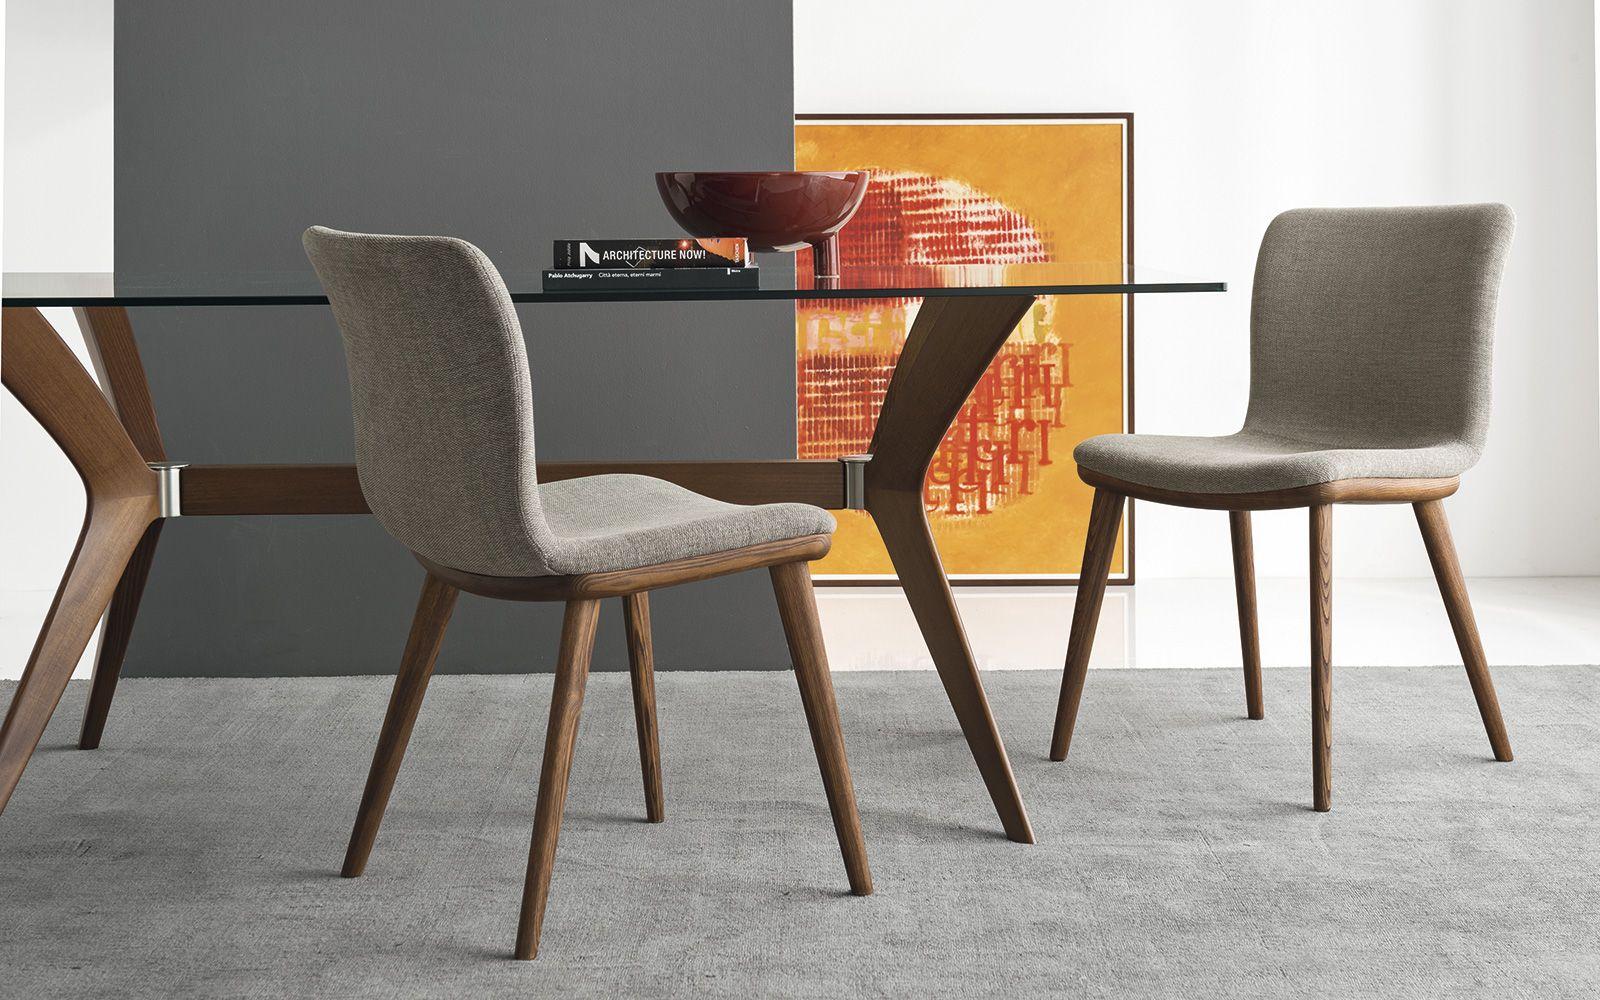 Callegari Sedie ~ Sedia annie di calligaris sedie moderne annie